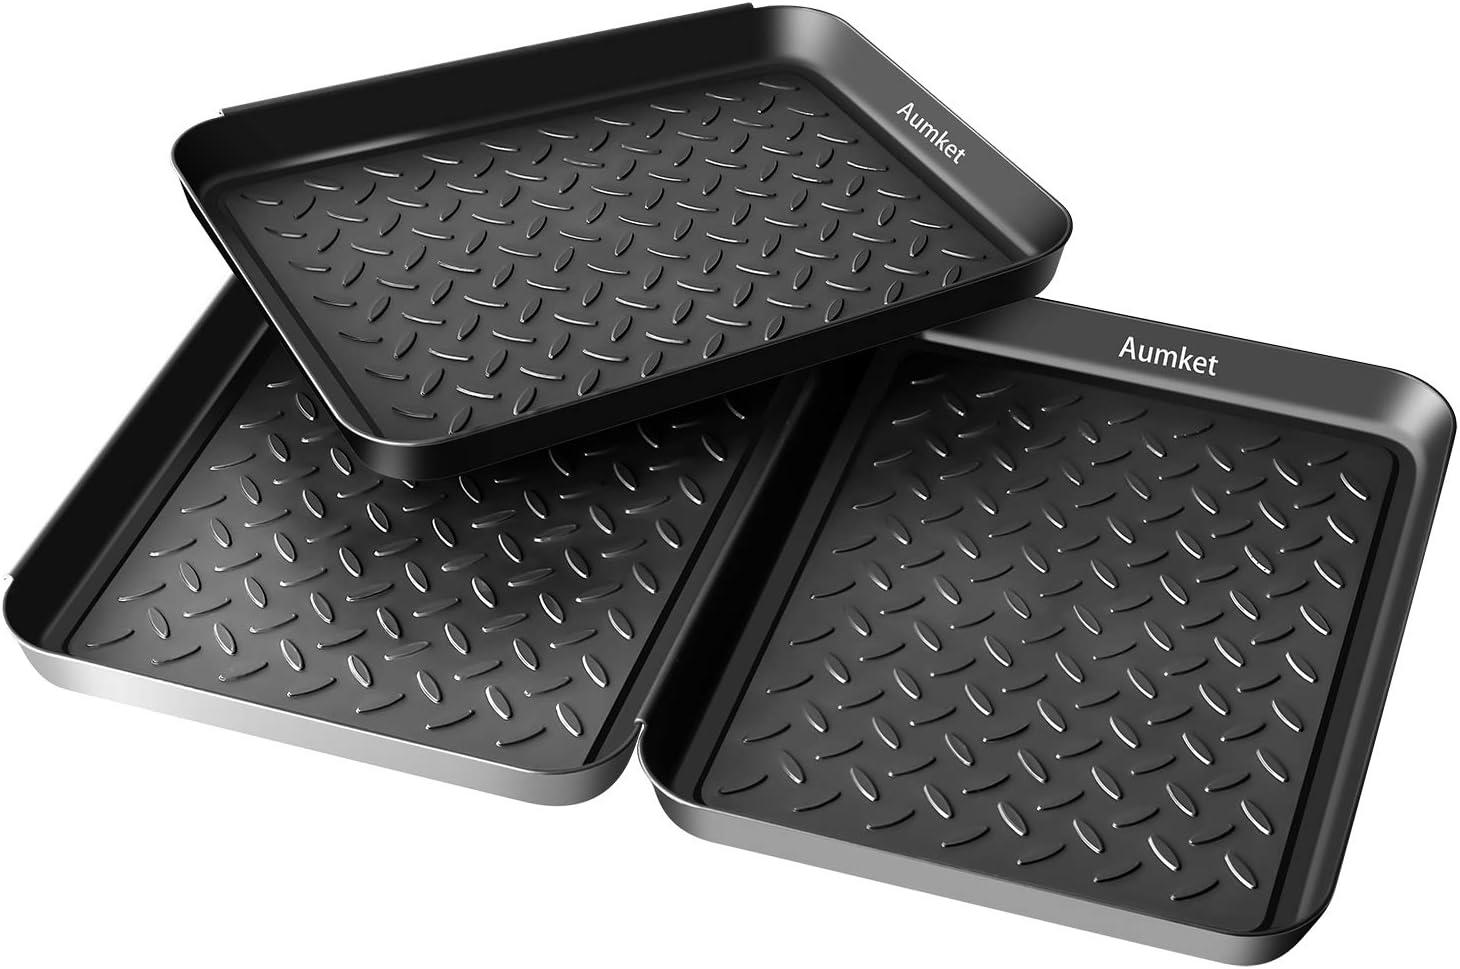 "Aumket Boot Mat Tray,3PCS Multi-Purpose 13.7"" x 10.6"" x 1.2"" Floor Protection-Pet Bowls-Paint-Dog Bowls,Shoes, Pets, Garden - Mudroom, Entryway, Garage-Indoor and Outdoor Friendly ((Black 3PCS)"